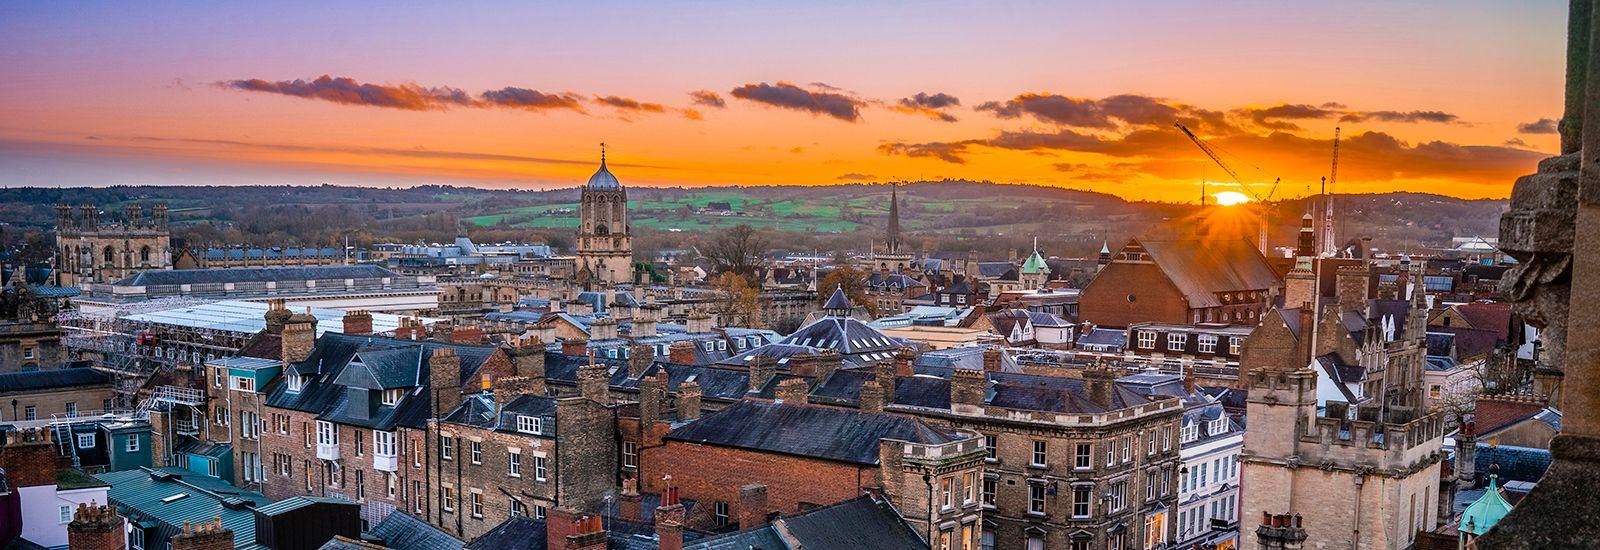 Sunset over Oxford skyline